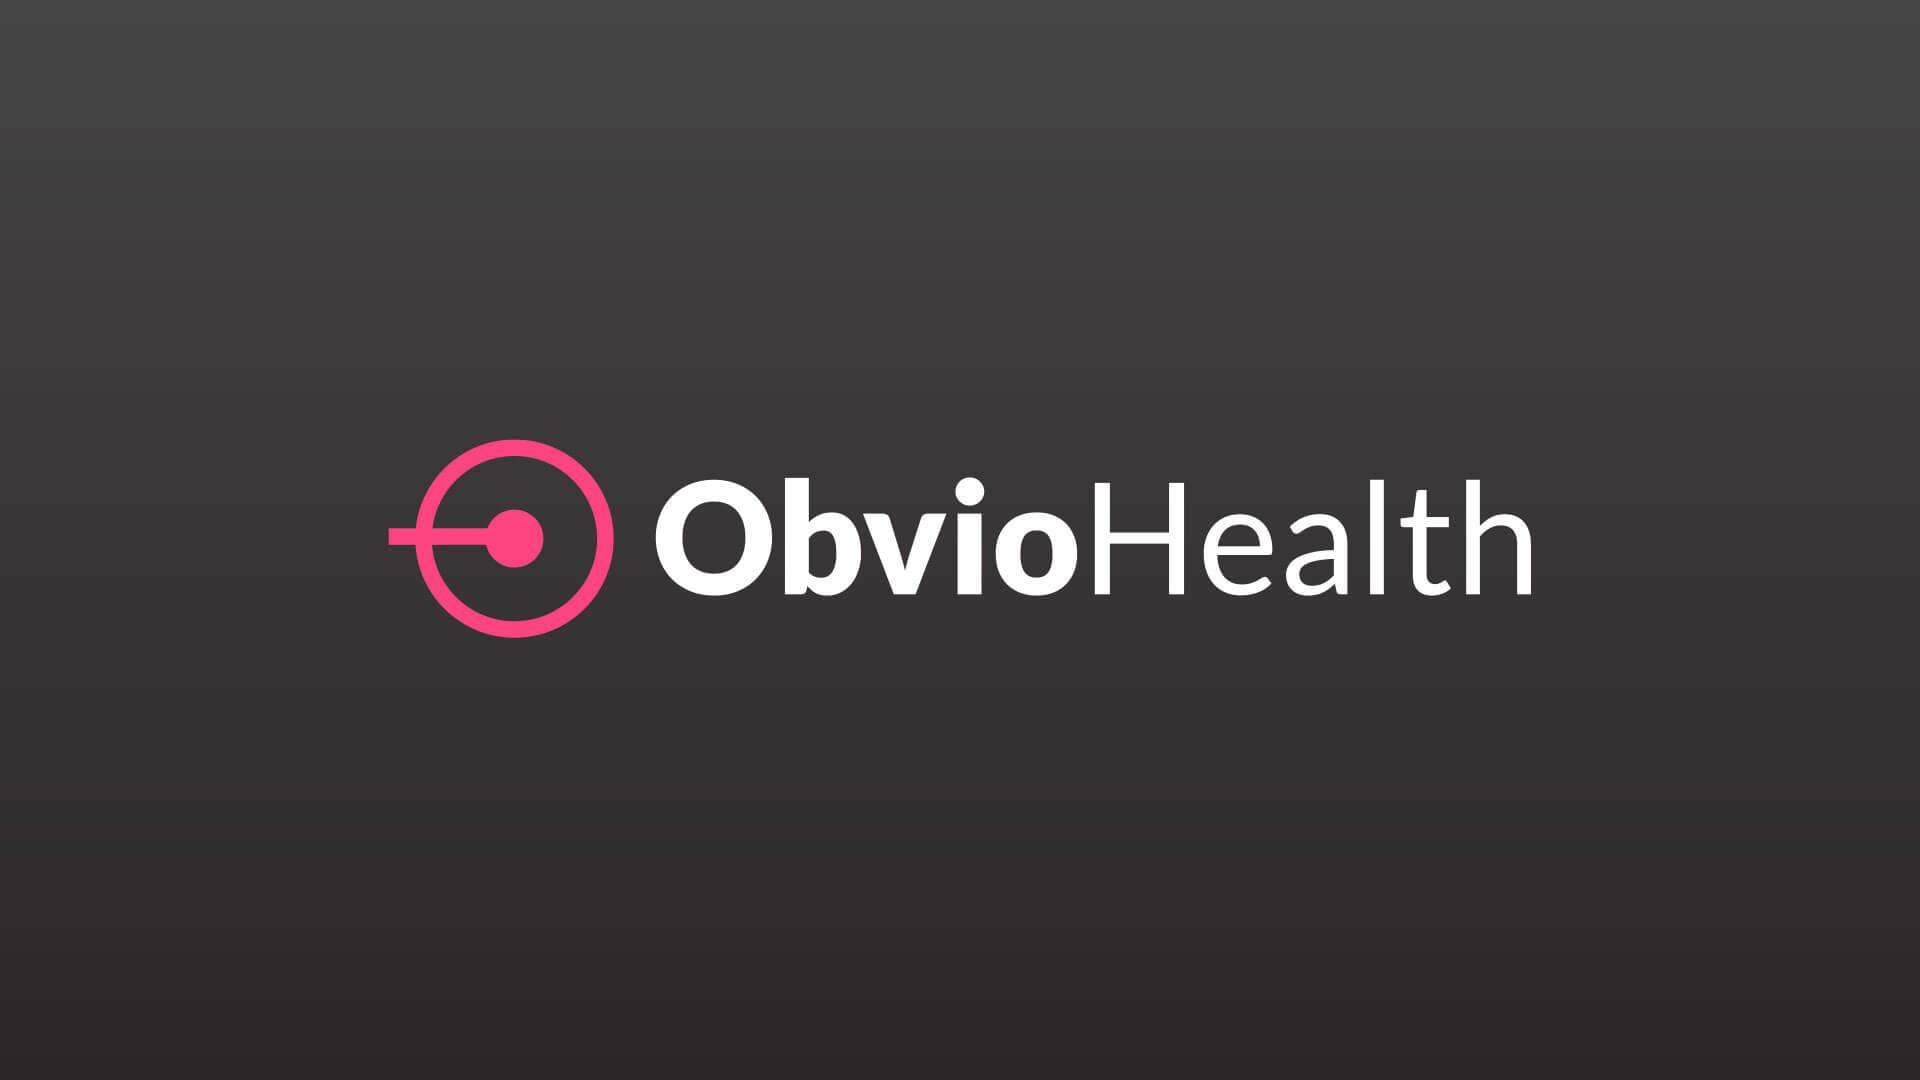 ObvioHealth primary logo on dark gray background.